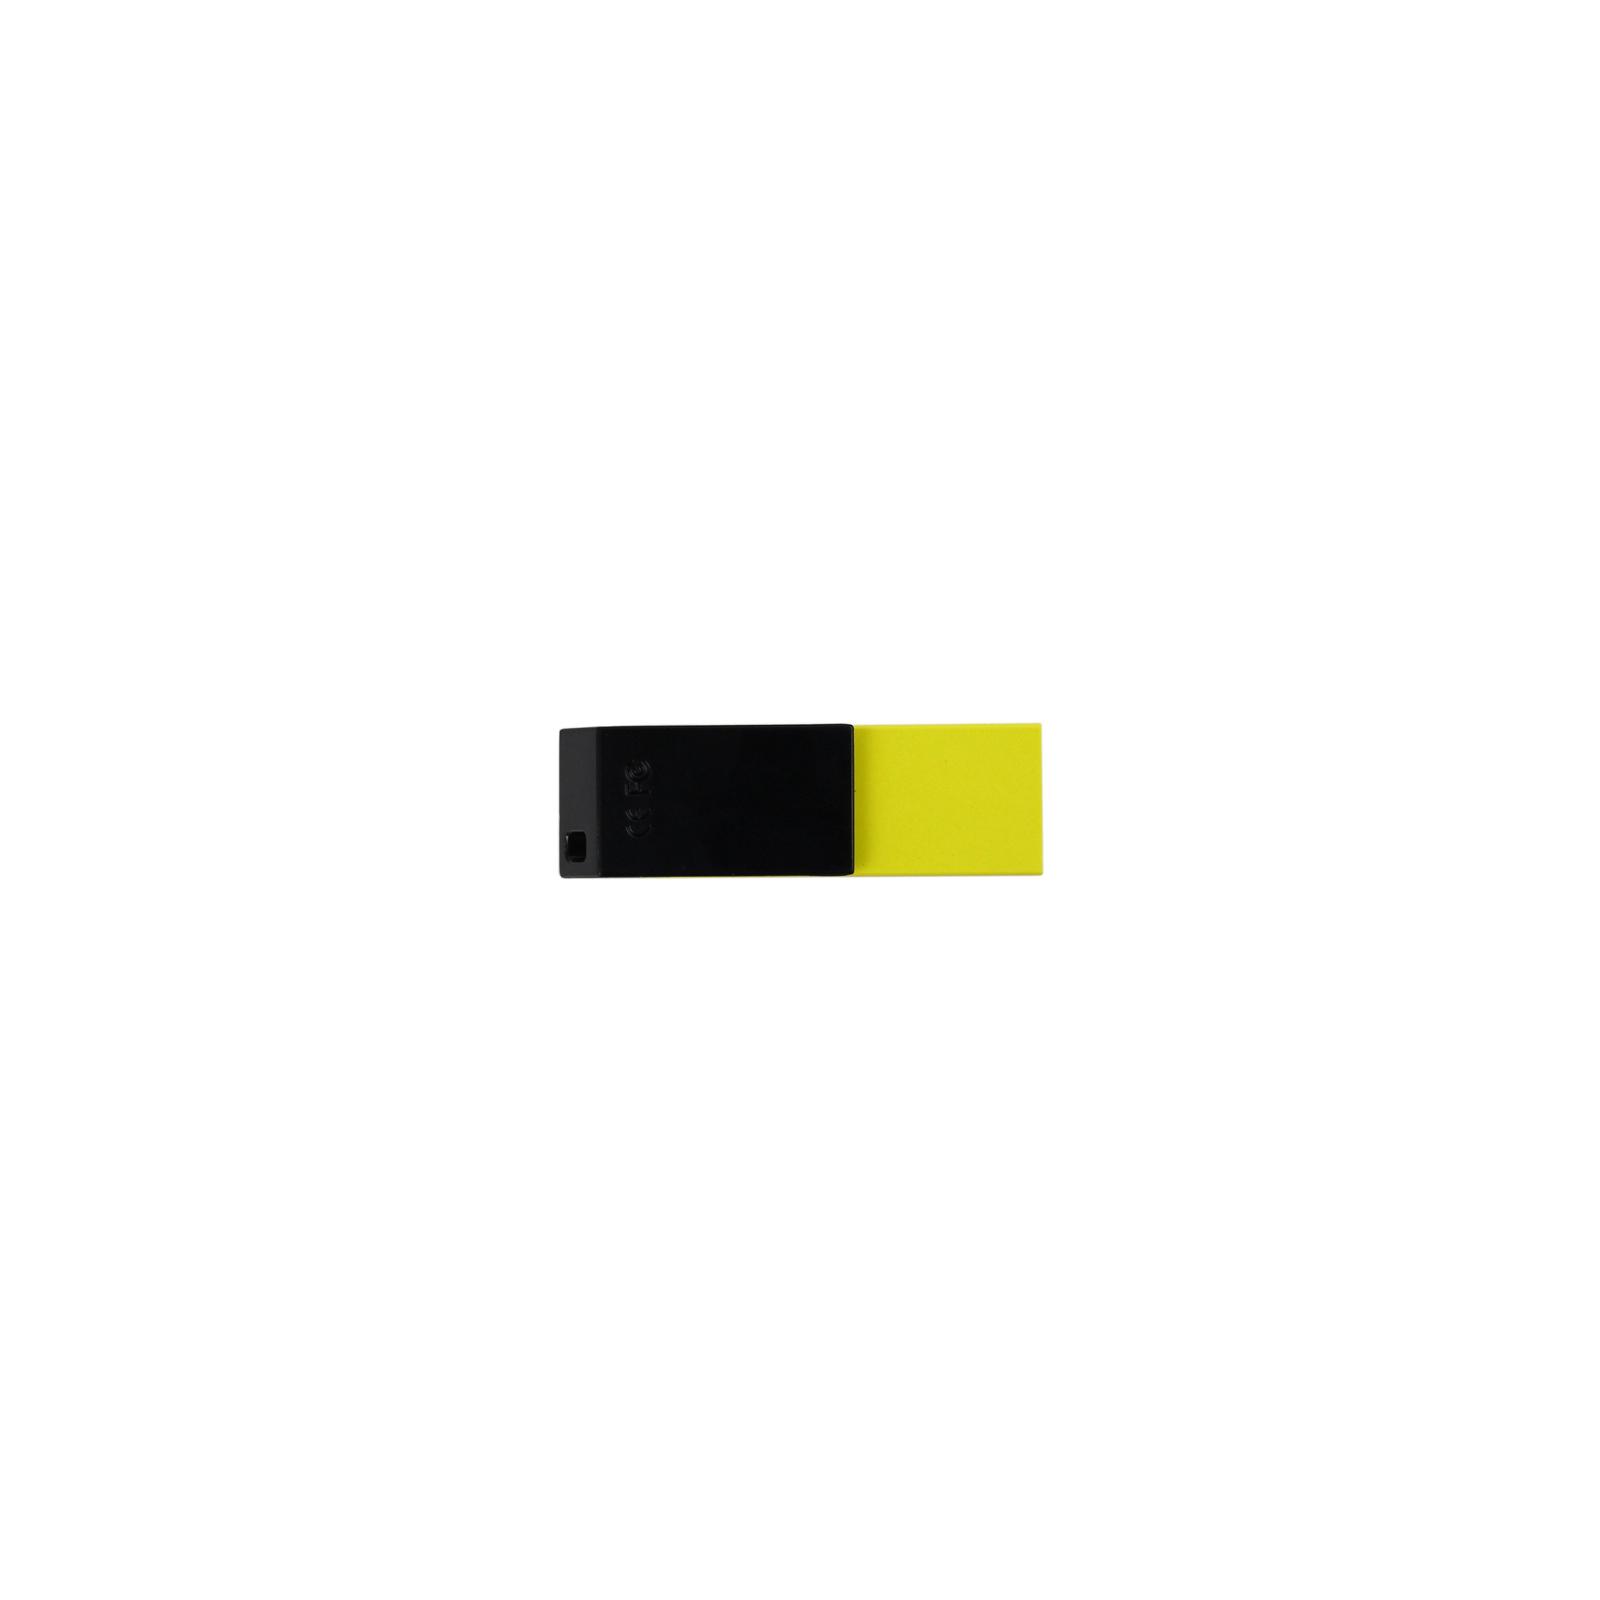 USB флеш накопитель 8GB AH131 Yellow RP USB2.0 Apacer (AP8GAH131Y-1) изображение 2